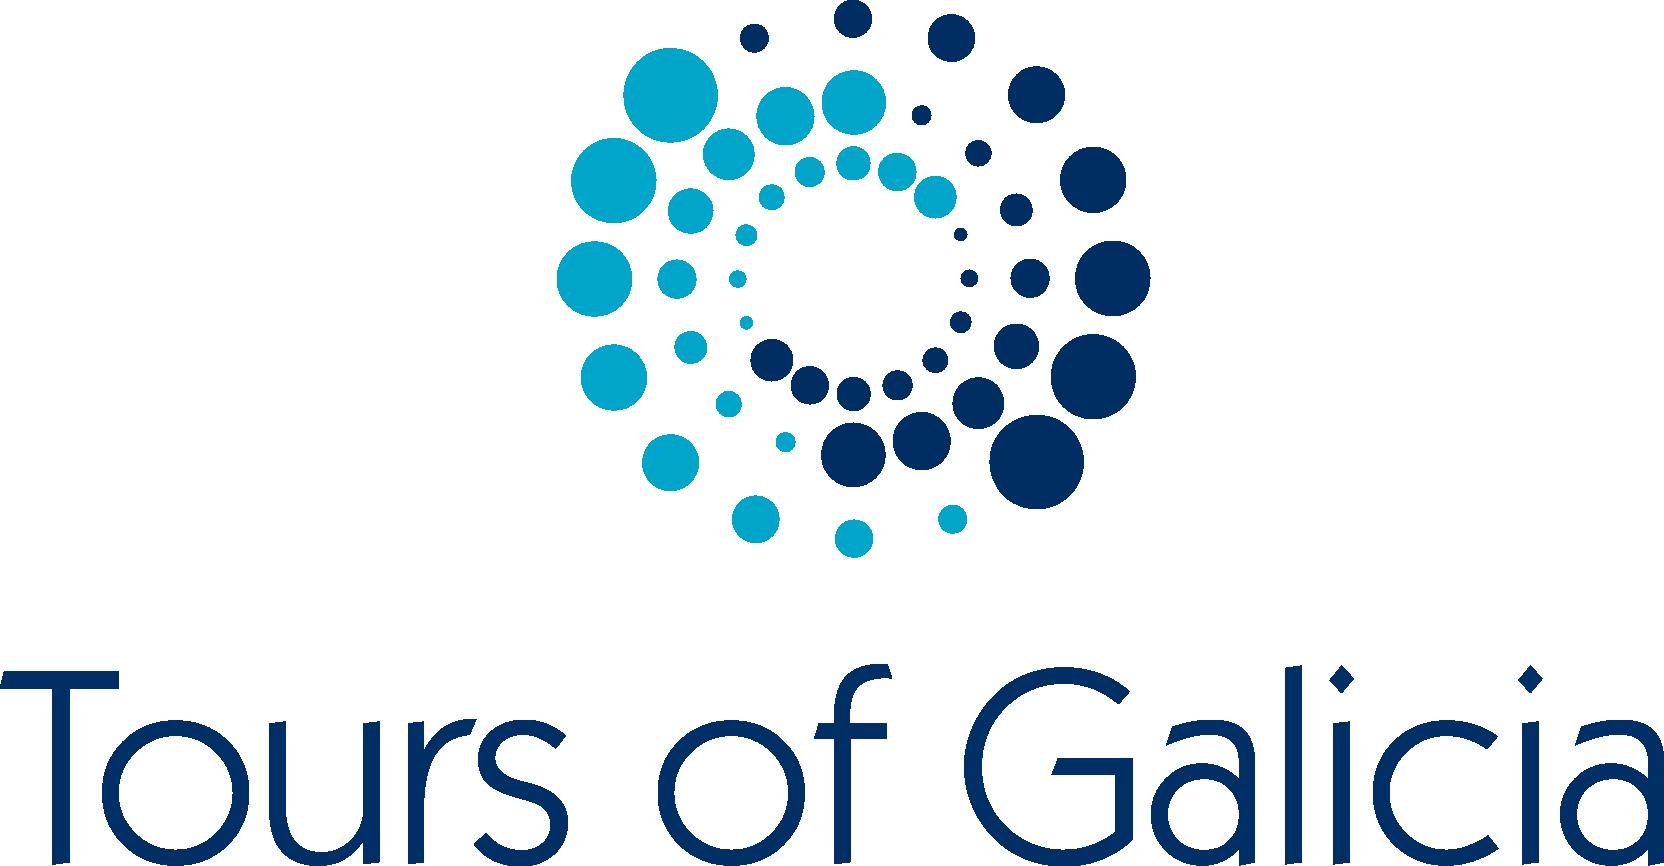 Tours of Galicia